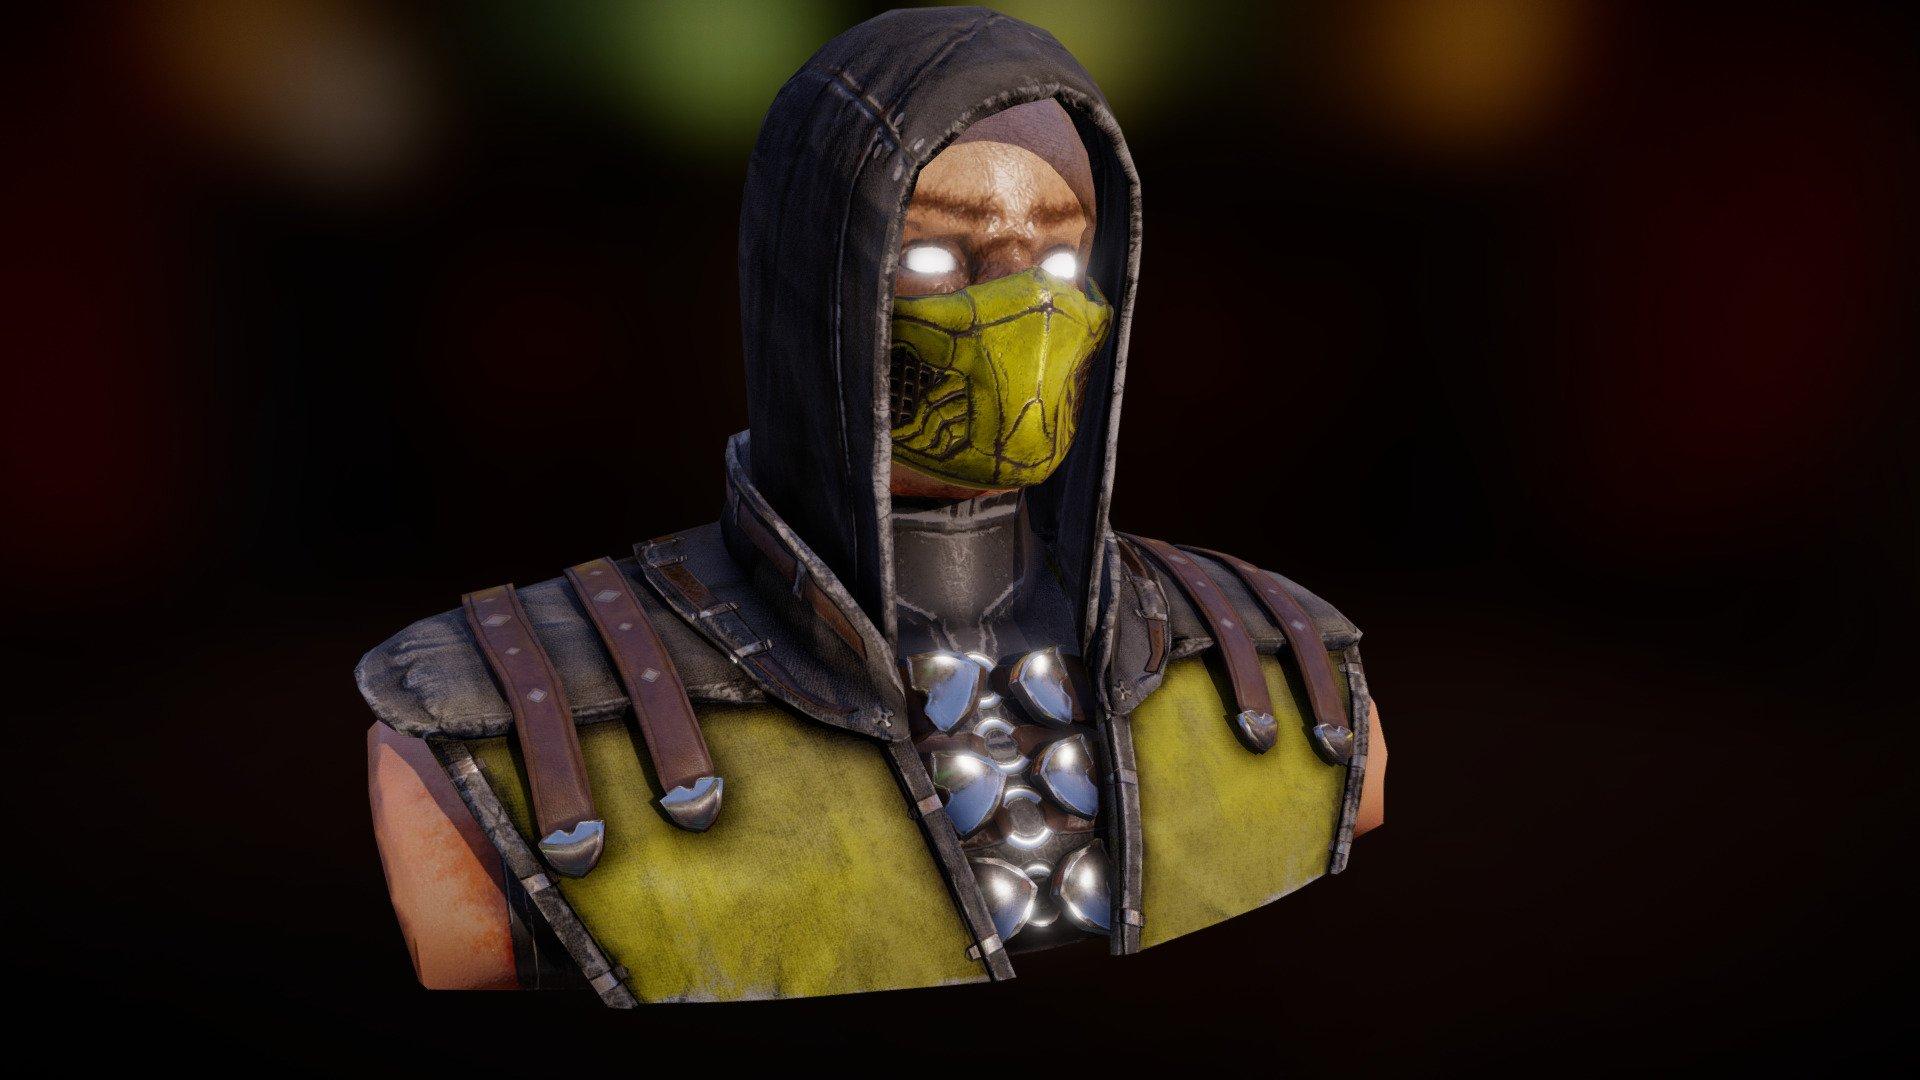 Mortal Kombat Online - Fan Submission - MKvsDC character